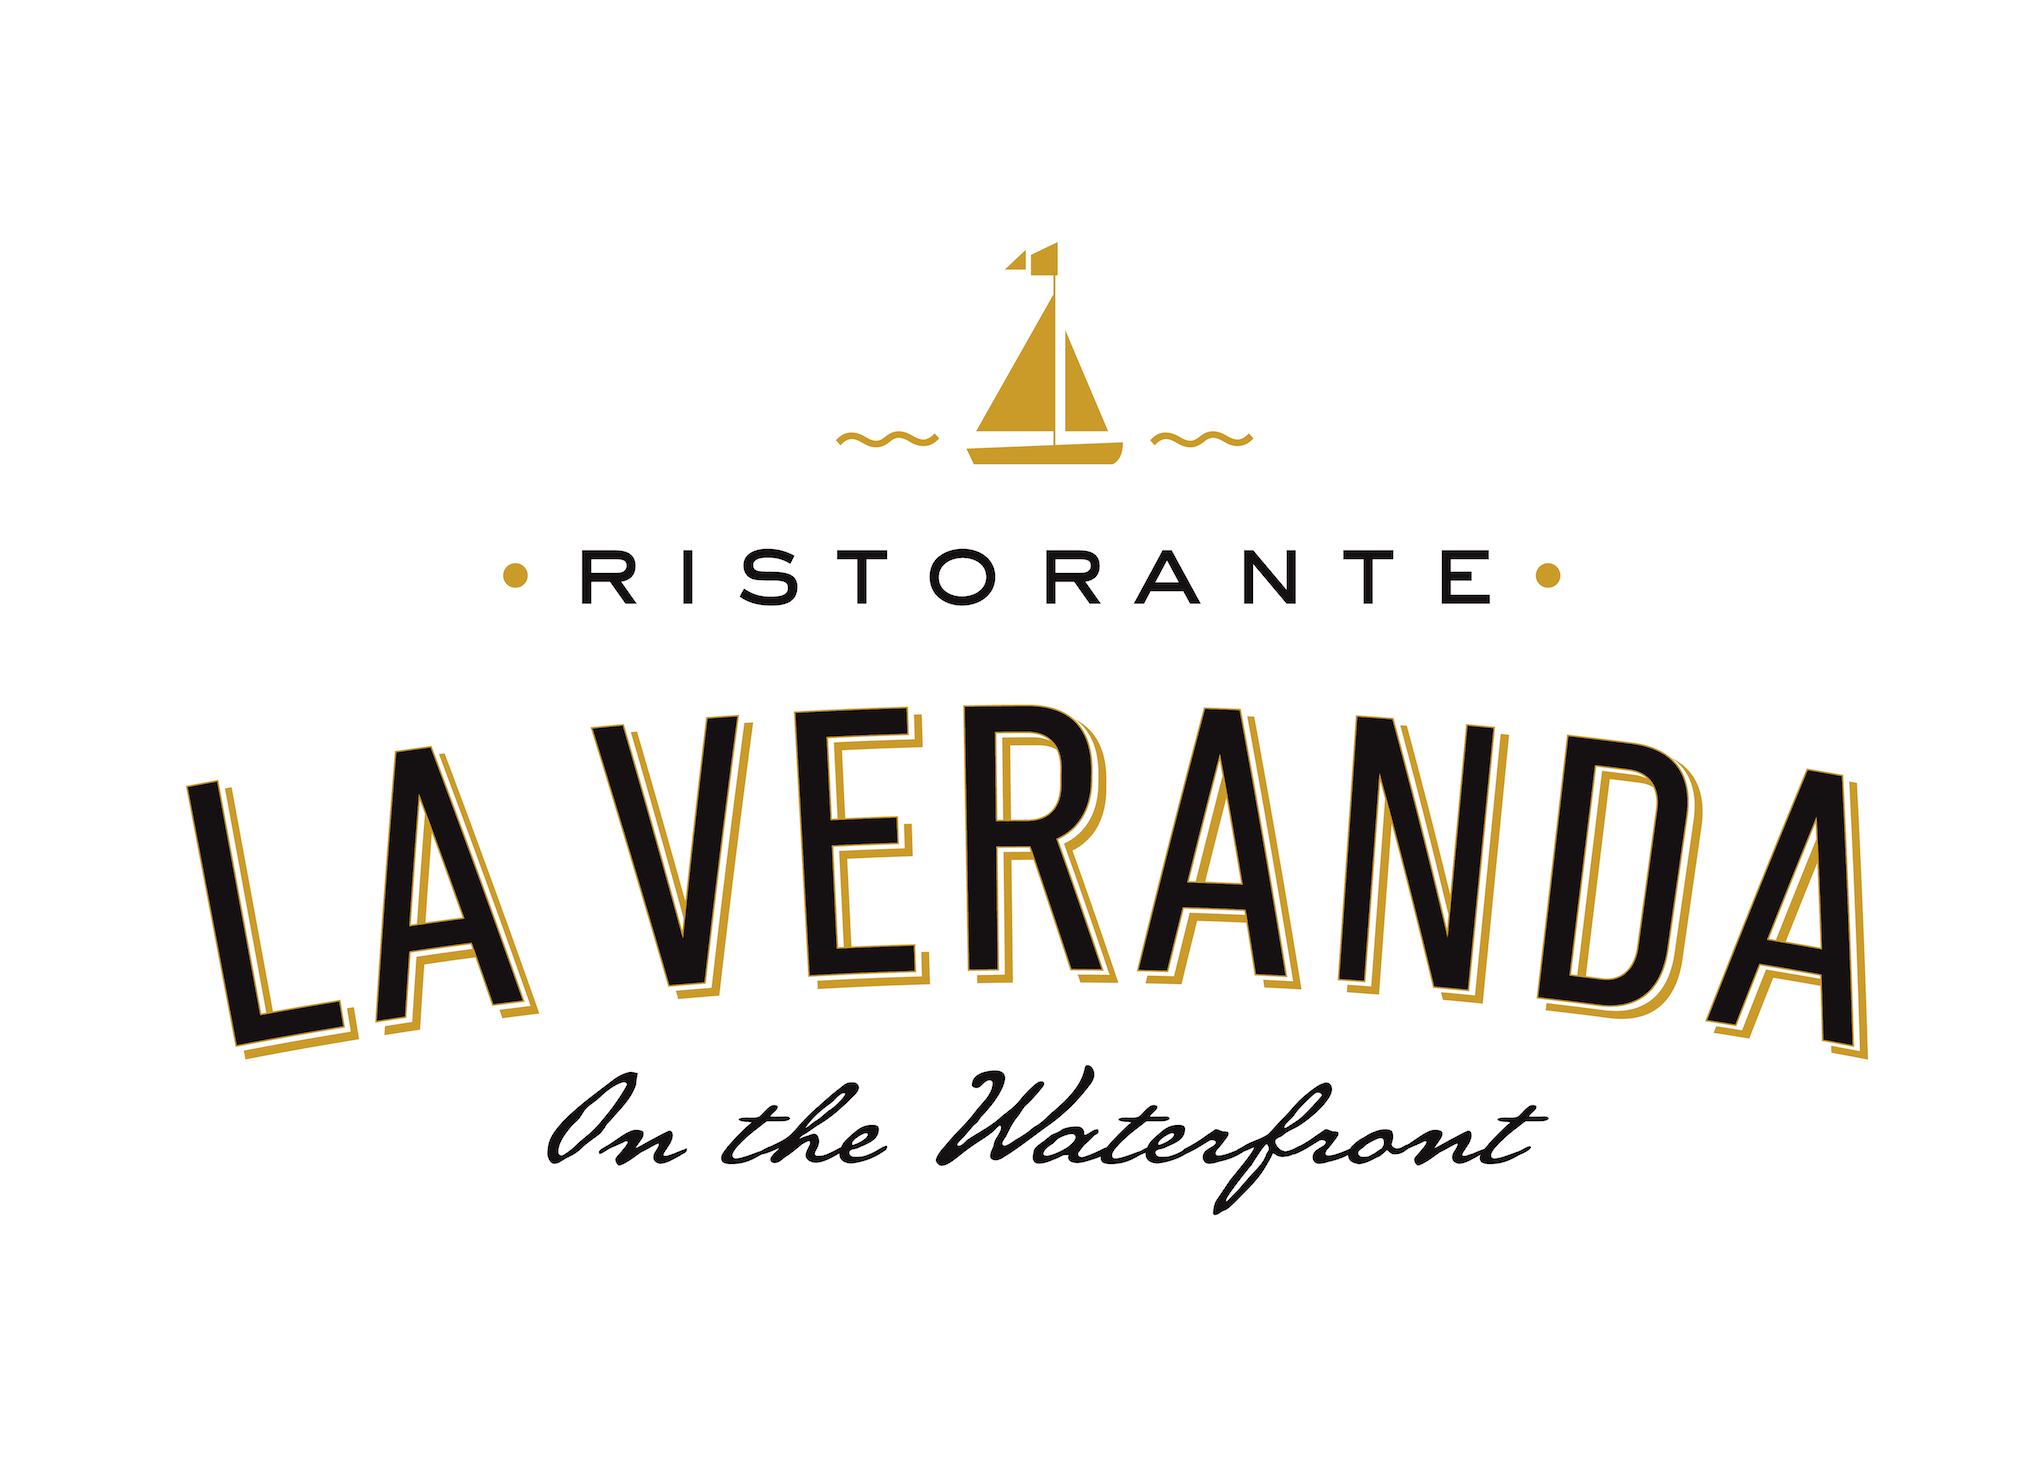 Modernize a logo for our elegant Italian Restaurant on the waterfront!